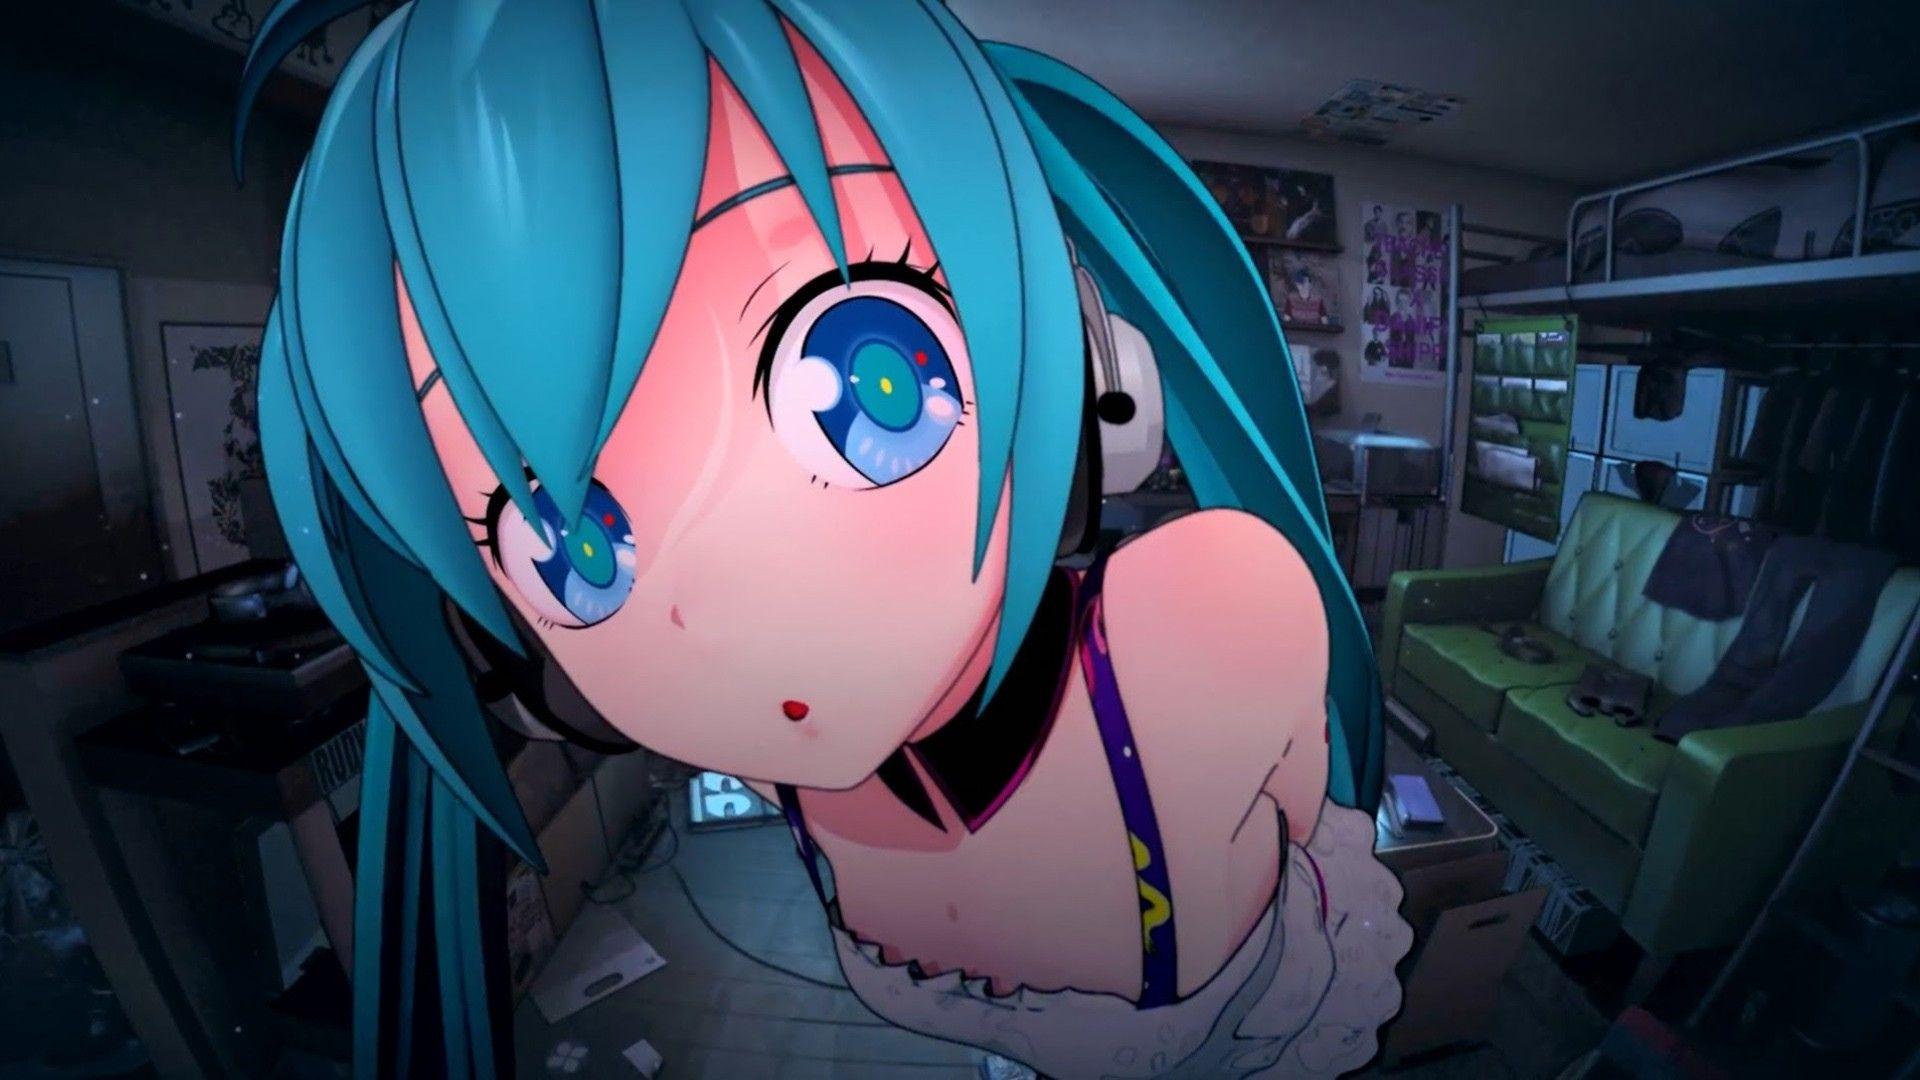 wallpaper anime vocaloid 1920 x 1080 full hd 1920 x 1080 full